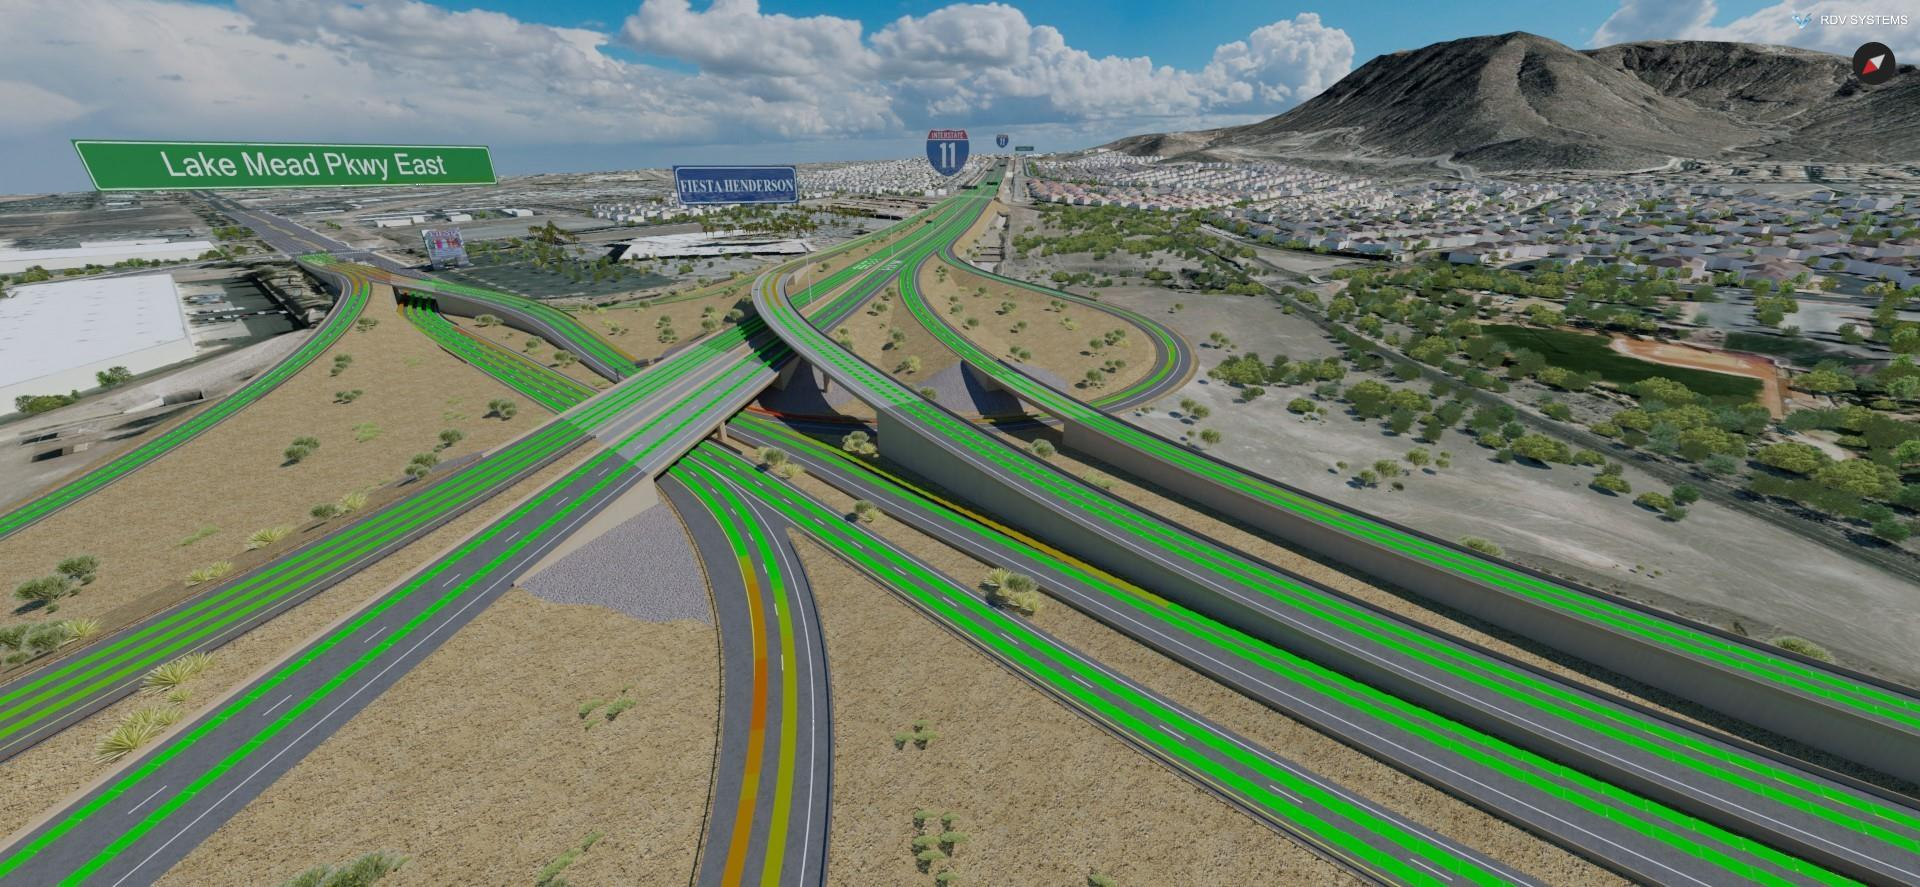 Road Safety Analysis of Henderson Interchange in Nevada | Innovative Visualization | RDV Systems